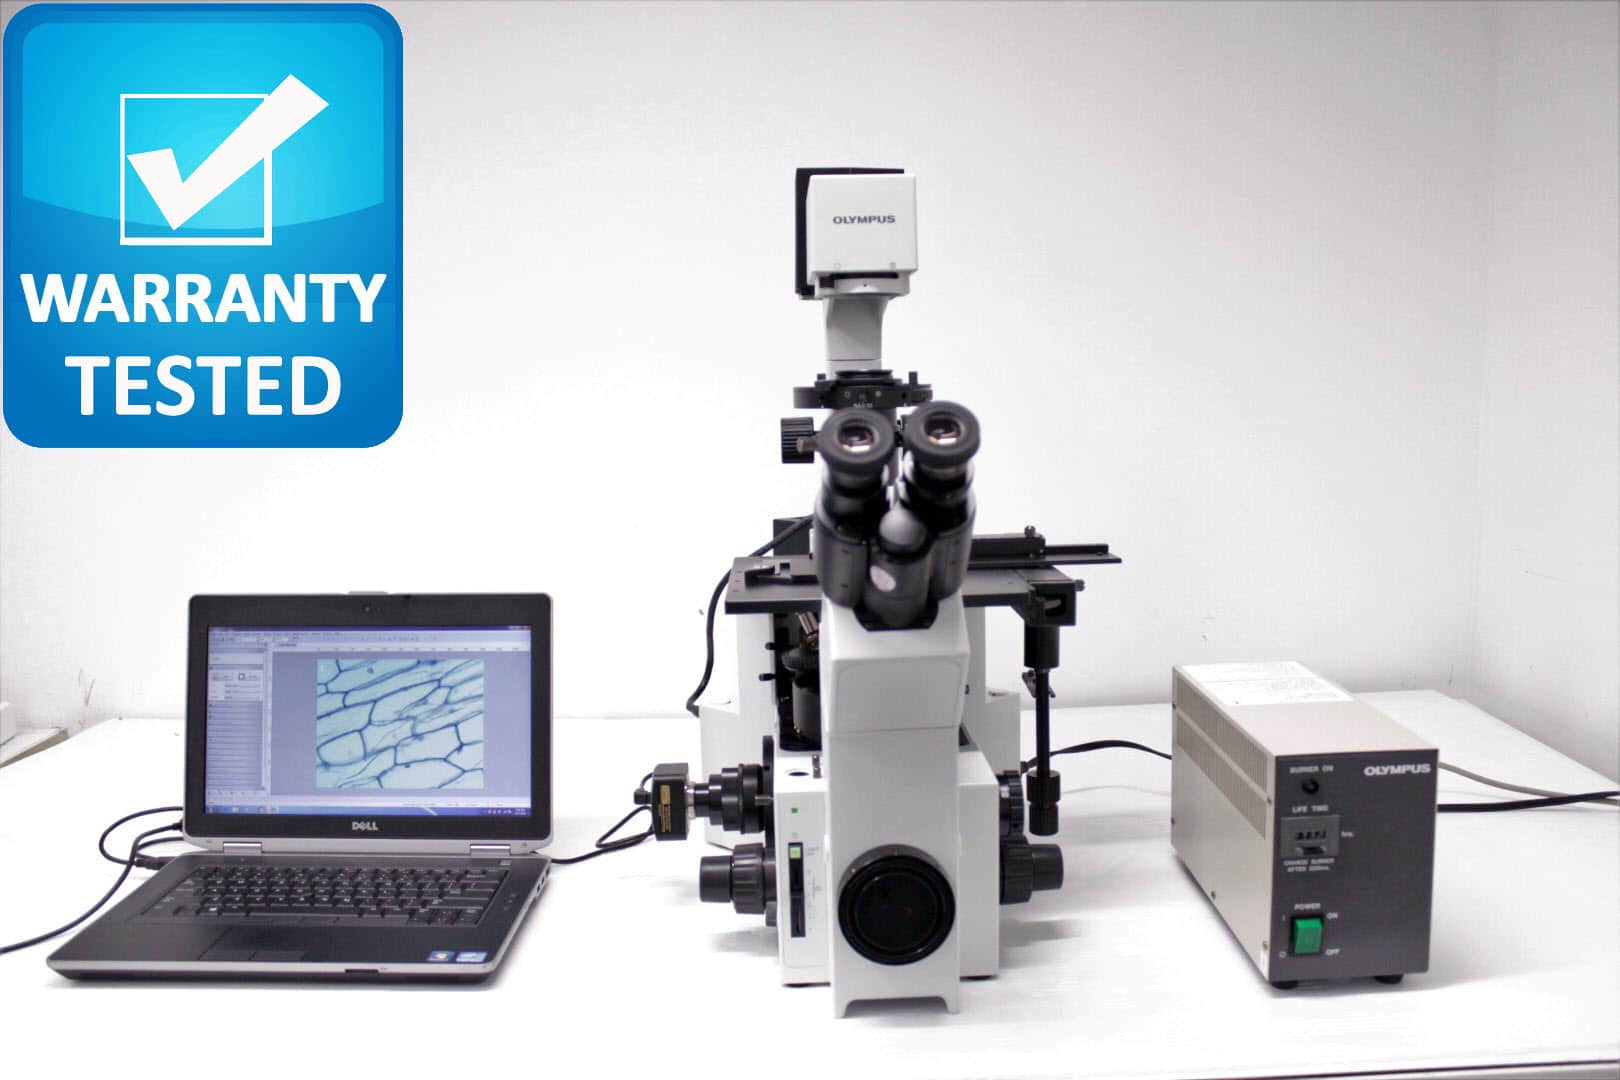 Olympus IX70 Inverted Fluorescence Phase Contrast Microscope Unit2